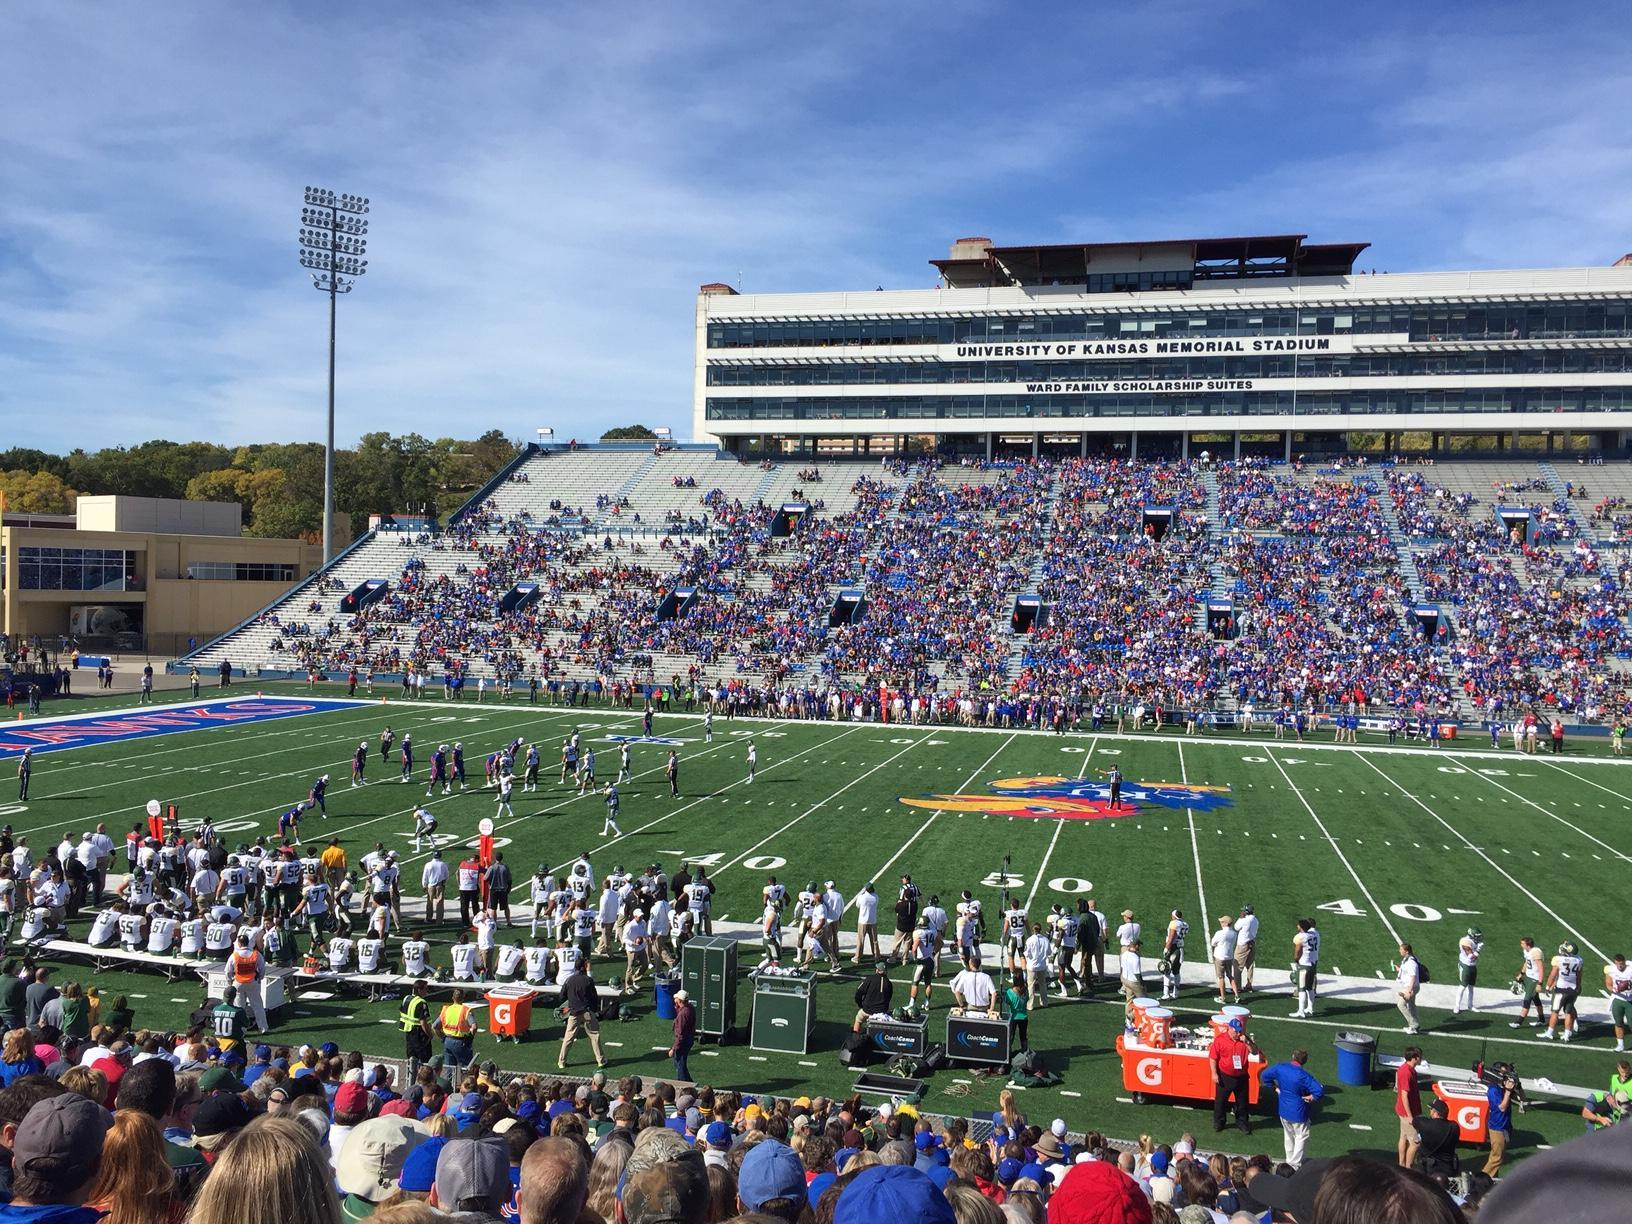 University of Kansas Memorial Stadium Section 21 Row 25 Seat 12